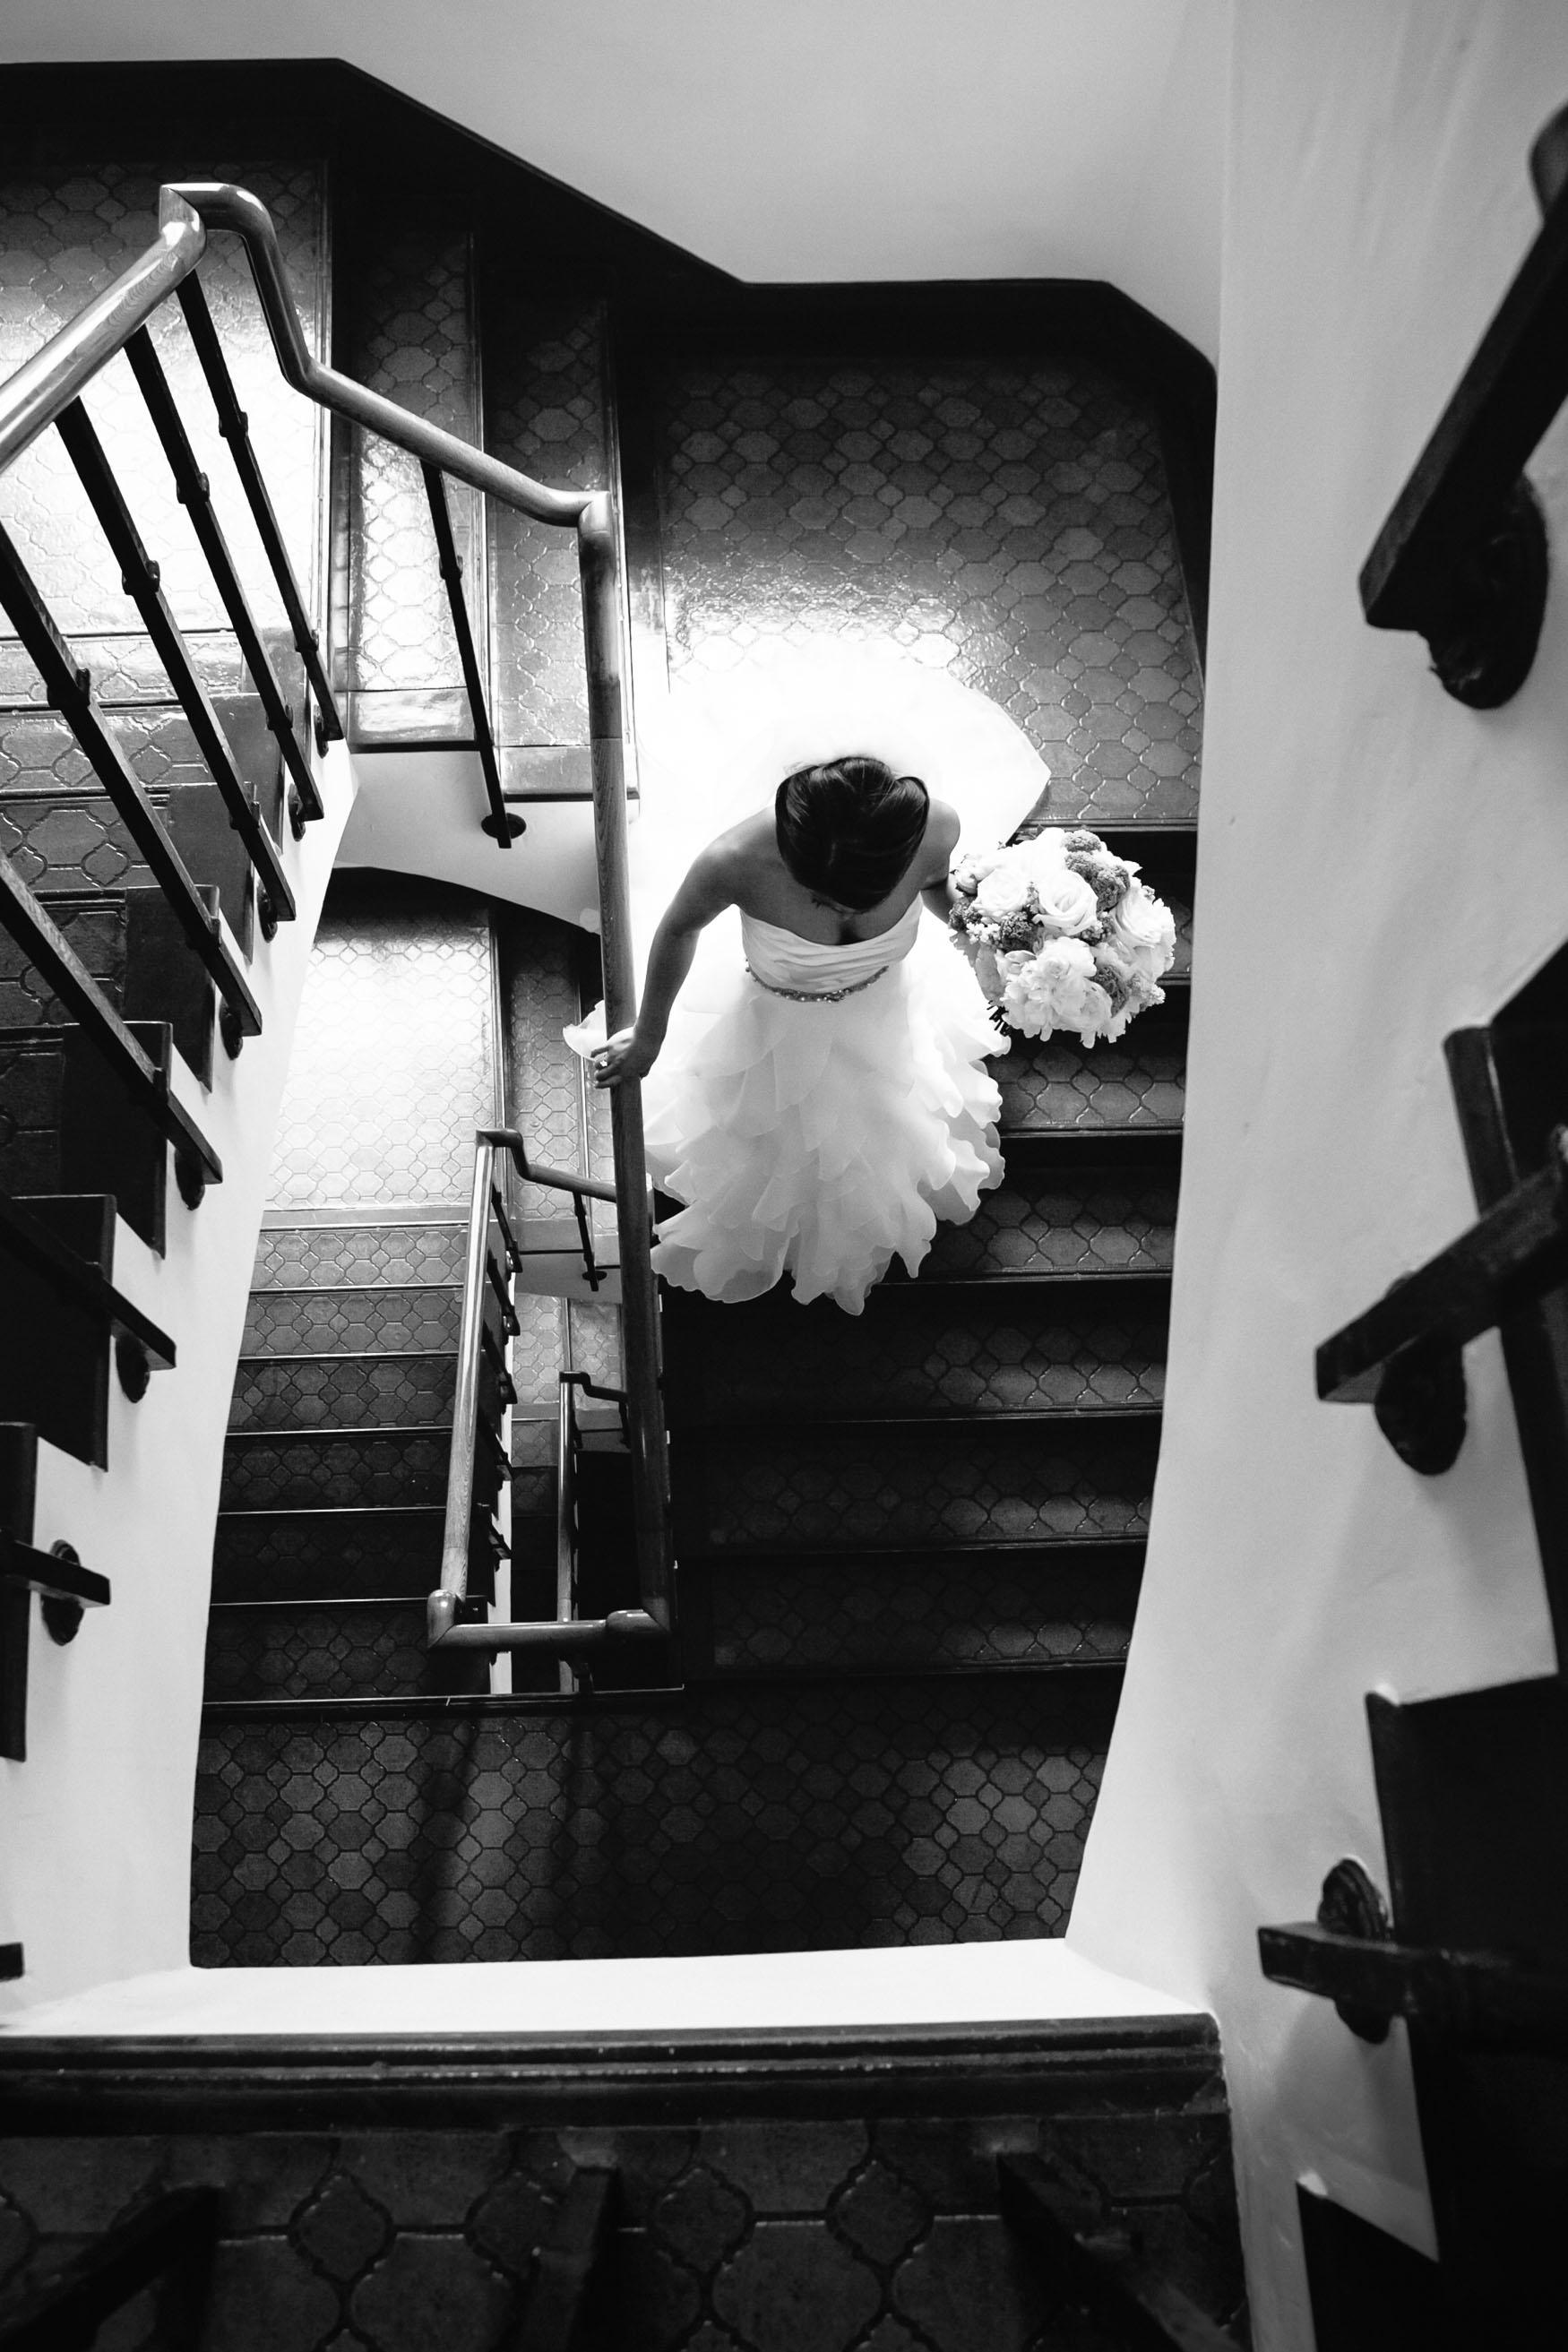 vibiana-wedding-photographer-asian-wedding-3630-Edit.jpg